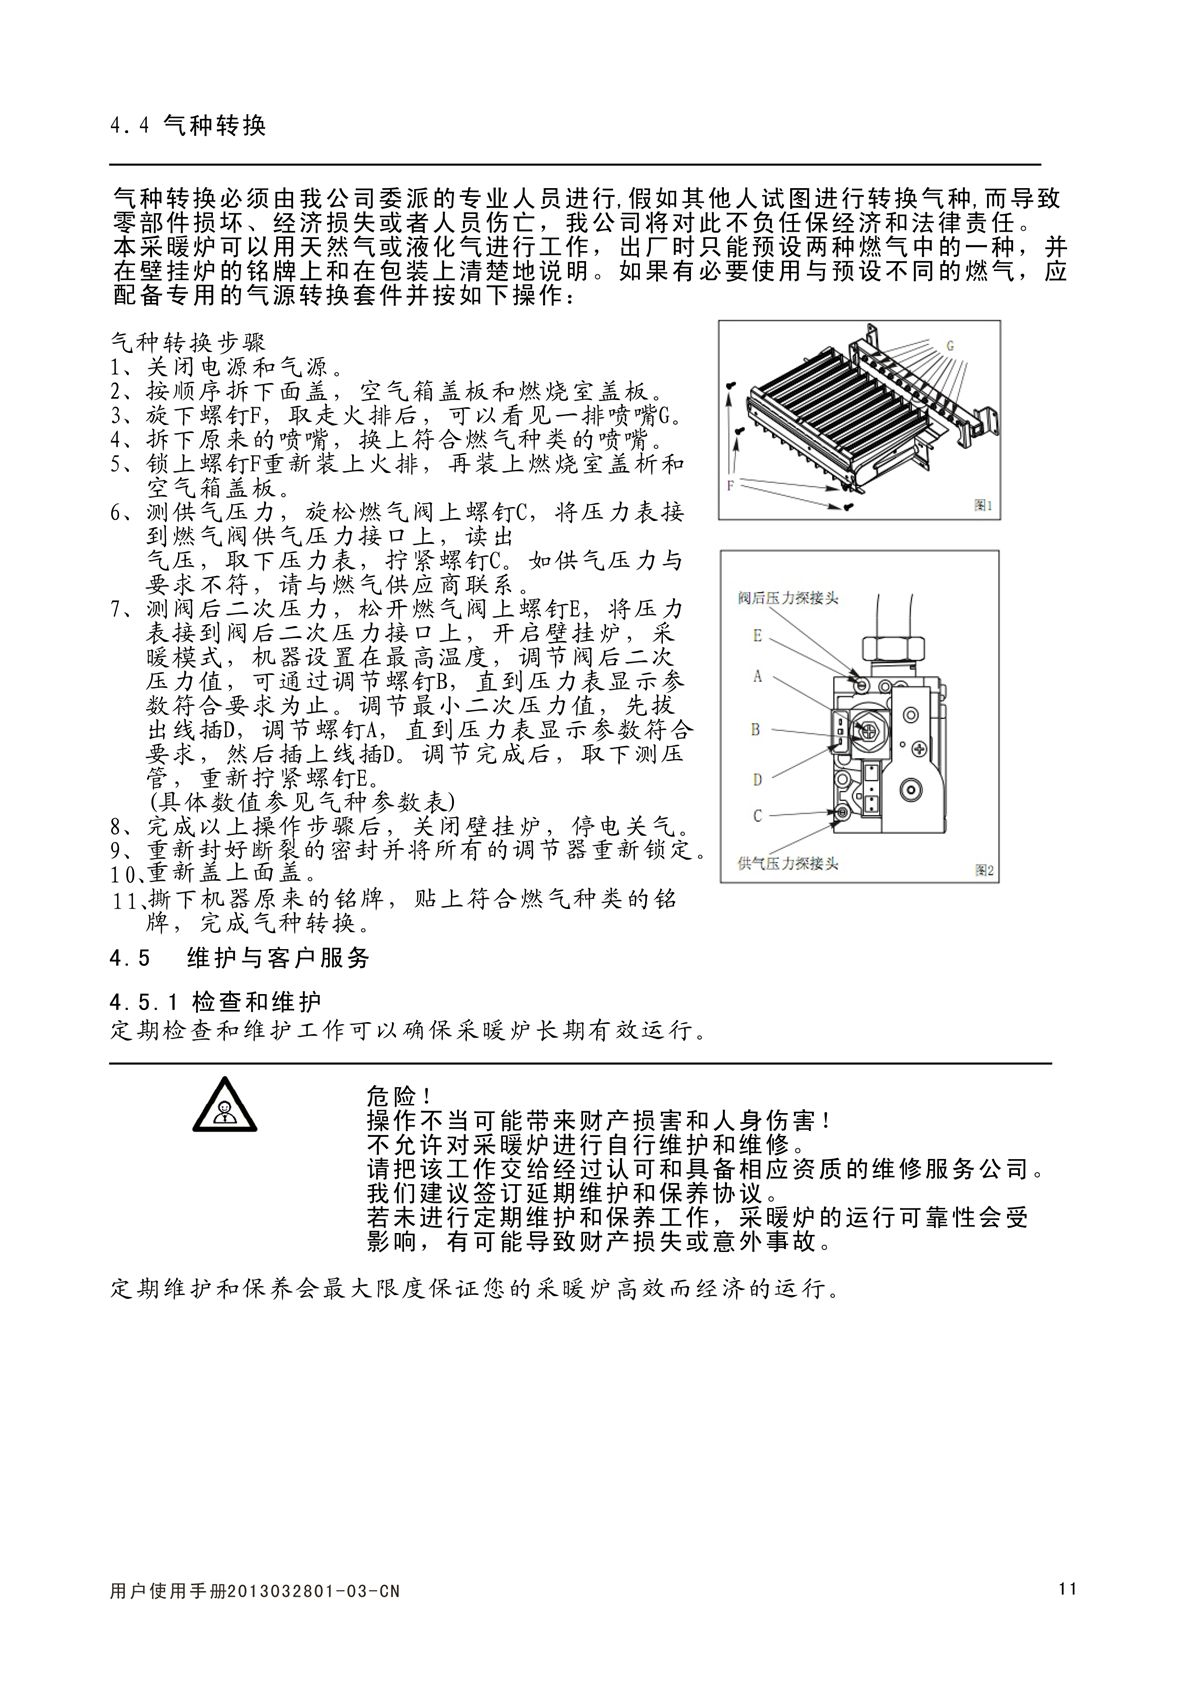 ES16A系列-用户使用手册-7_02.jpg